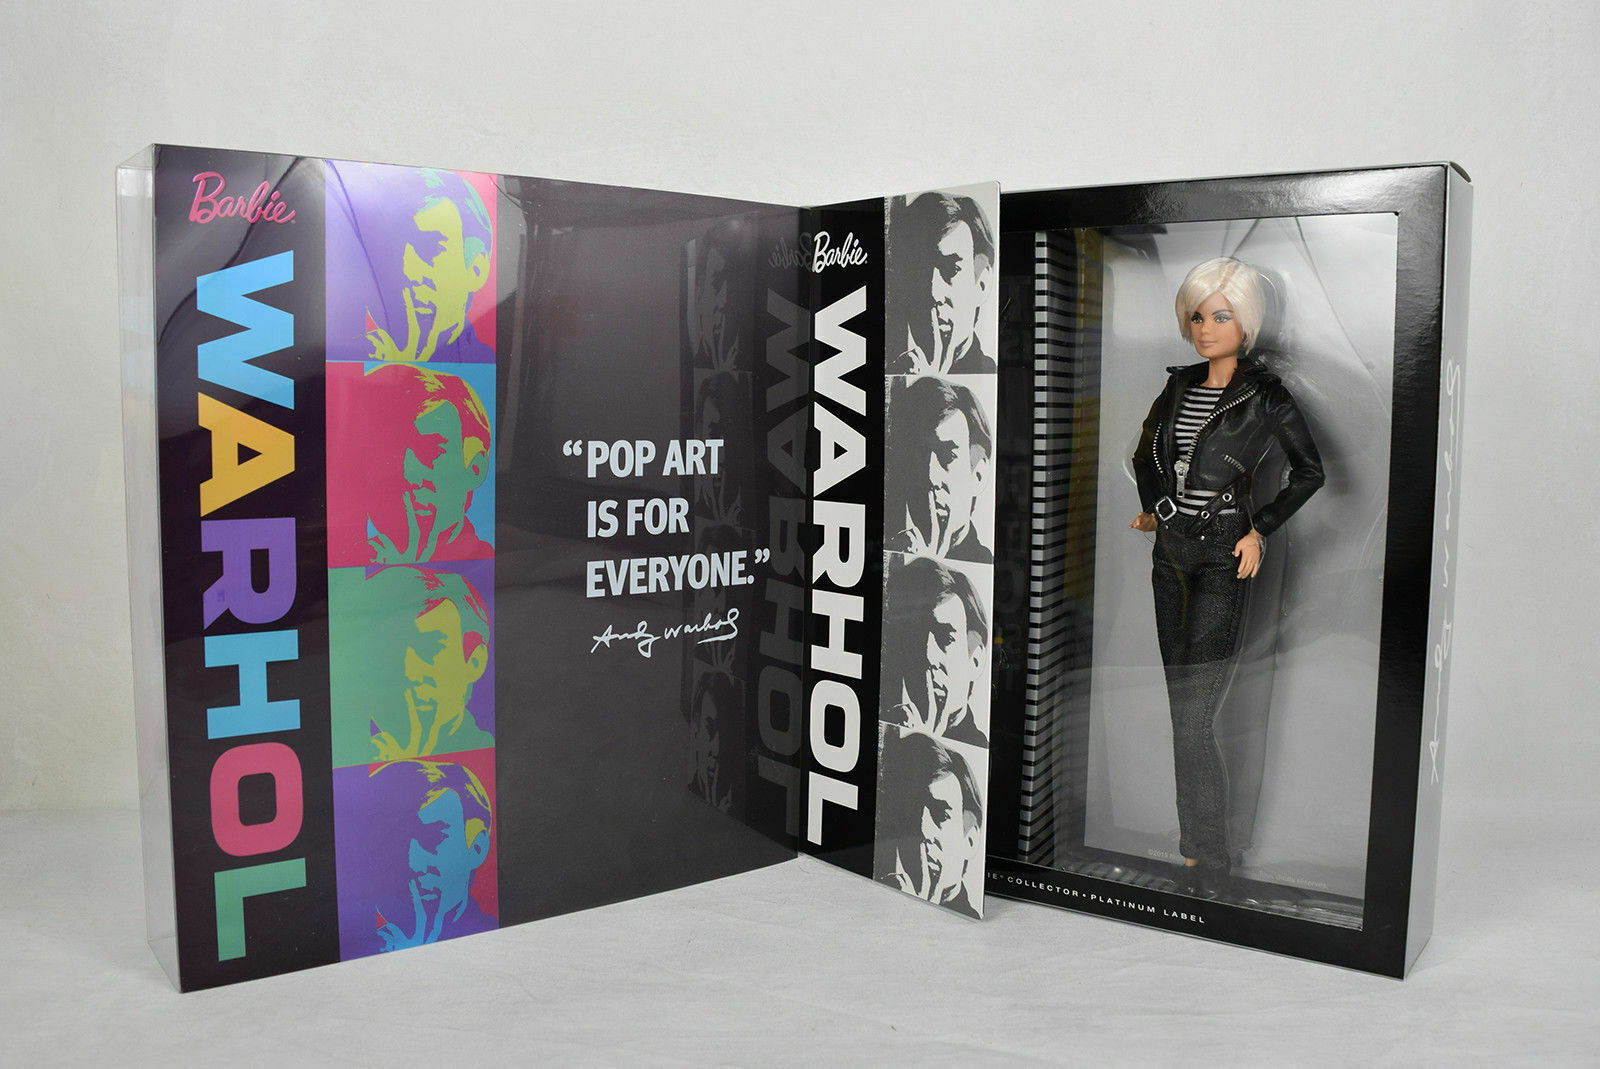 Raro Nuevo Sellado platino etiqueta muñeca Barbie Andy Warhol nunca quitado de la Caja Mattel 2015